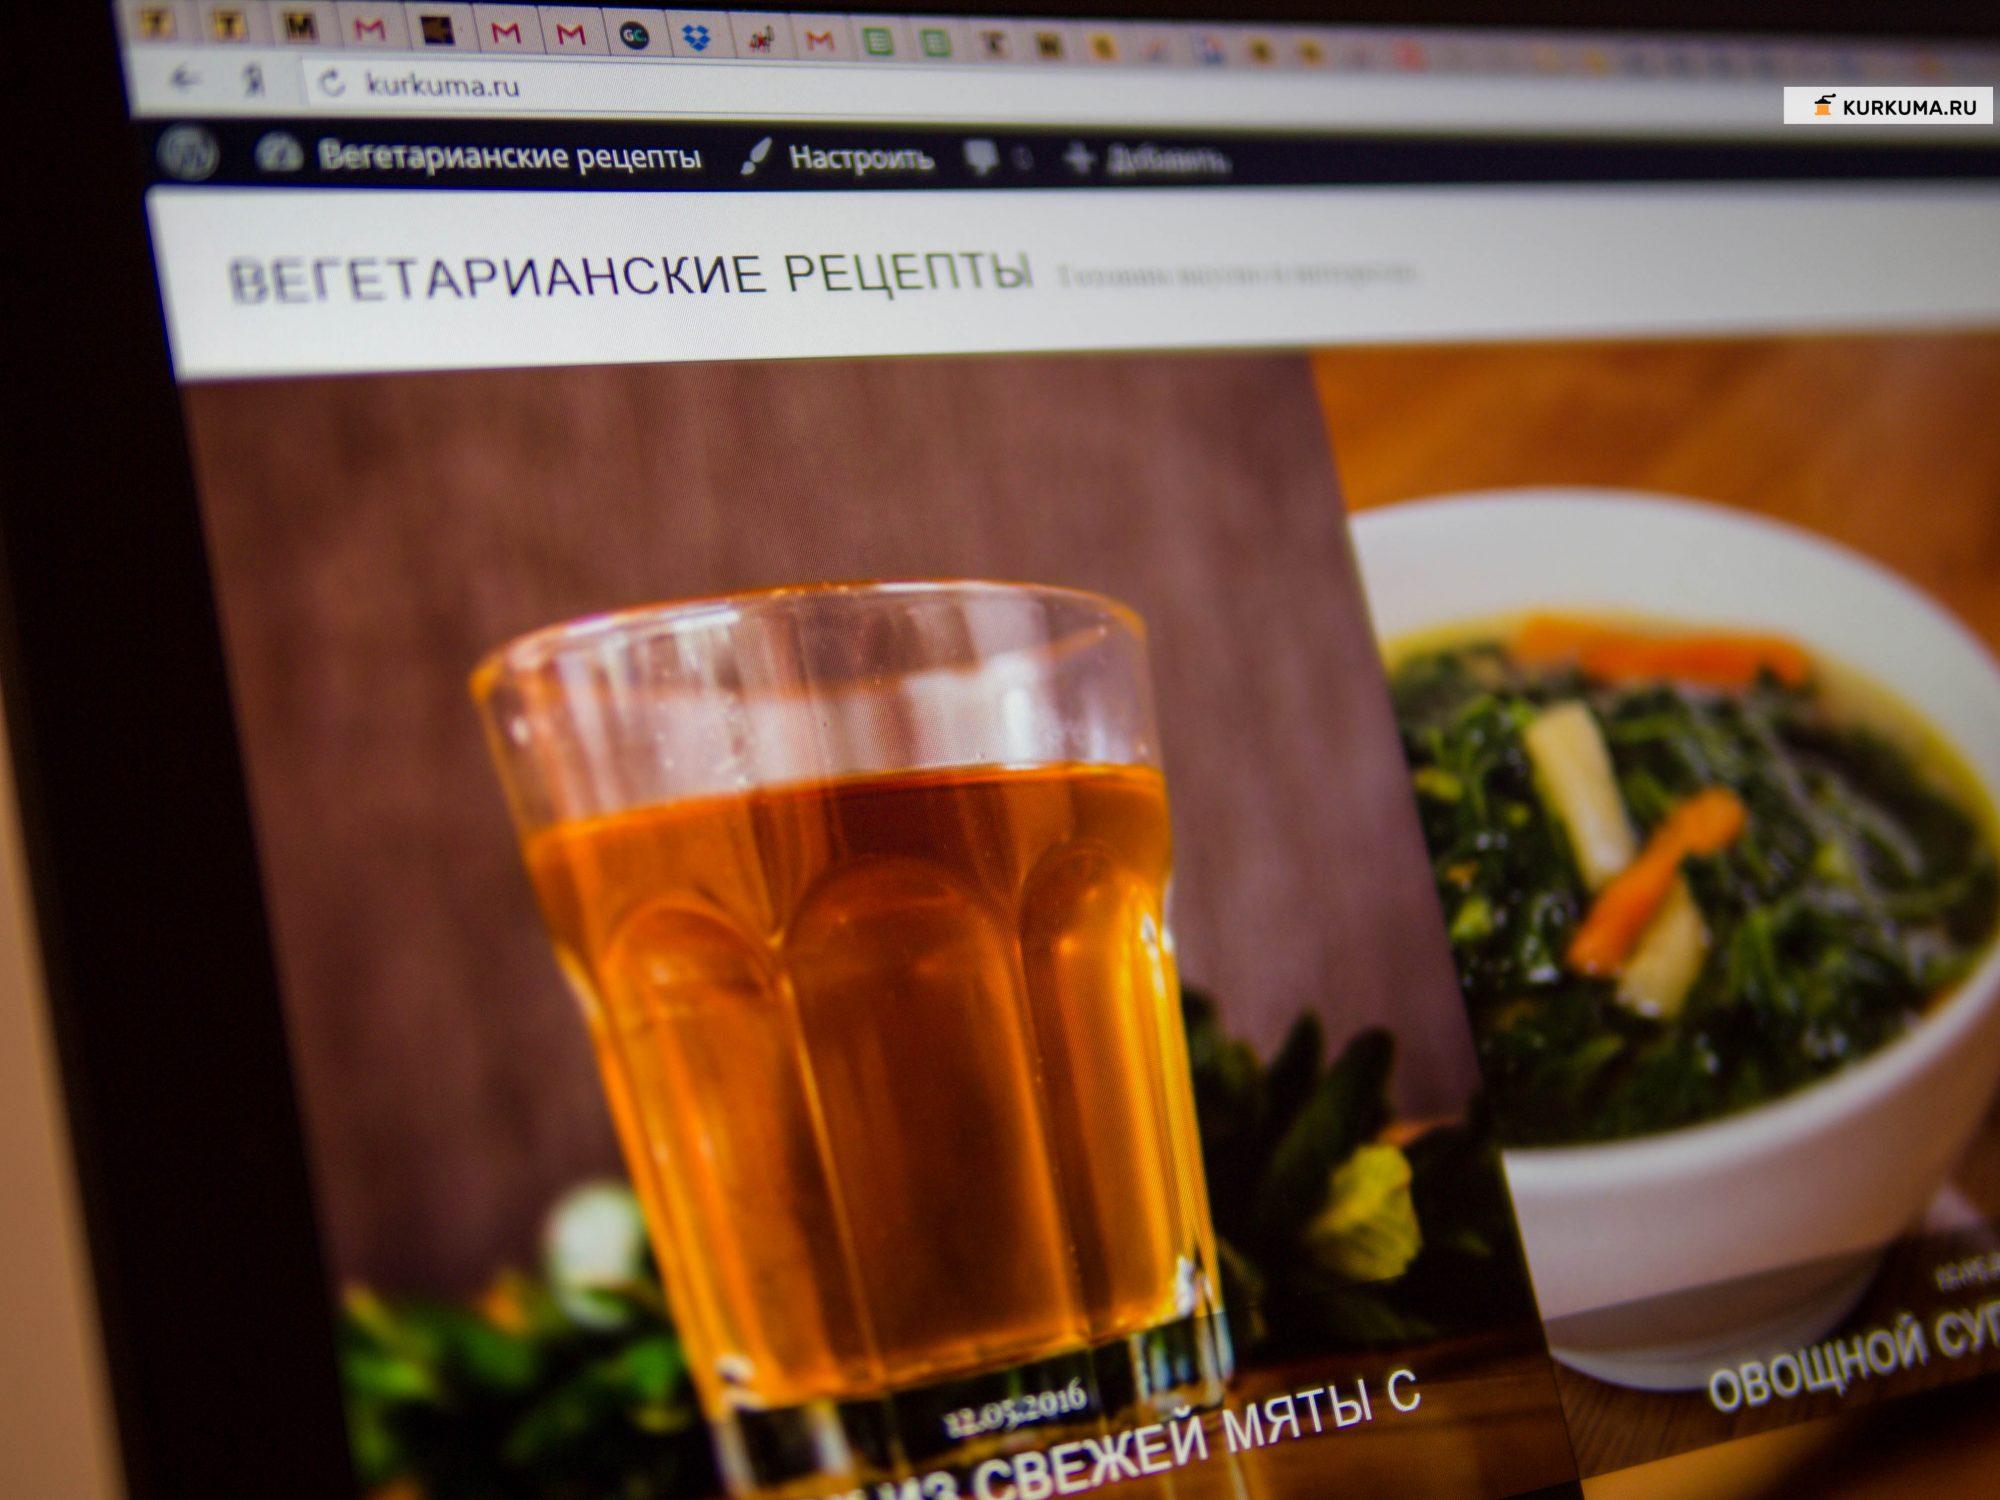 новый дизайн блога Kurkuma.ru